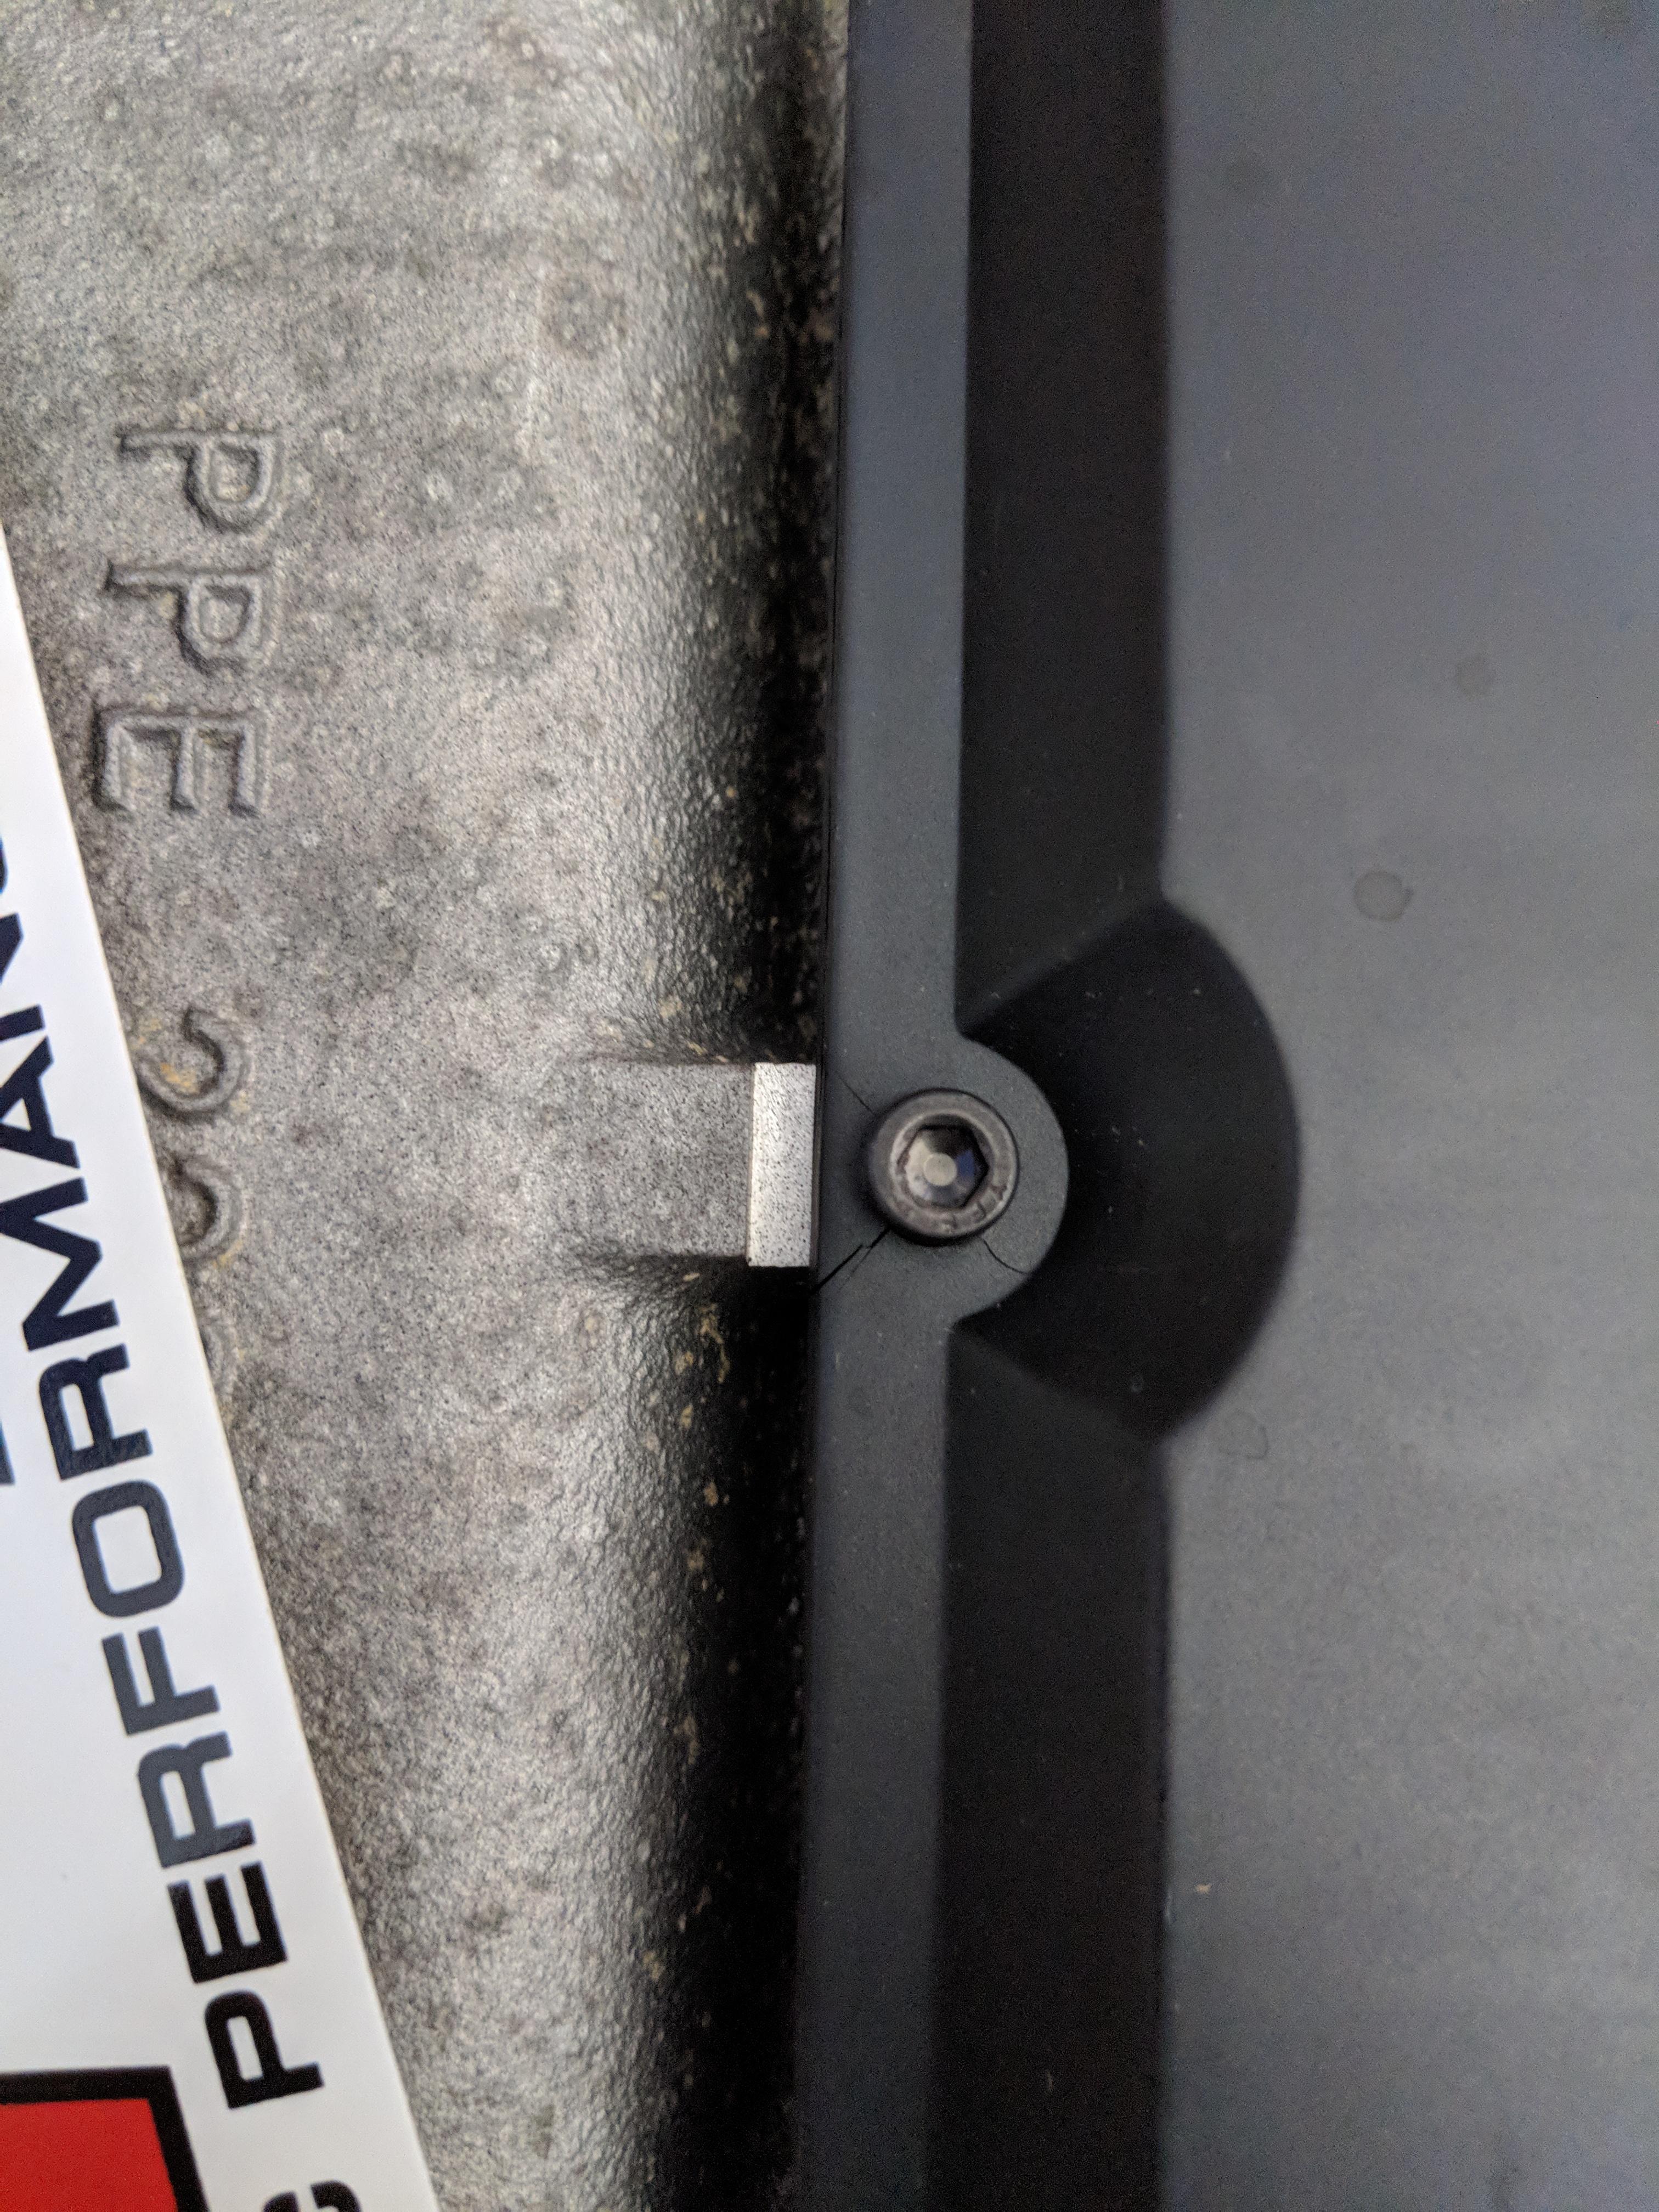 ZF 8HP plastic transmission pan differences-mvimg_20180524_133731_1561429939719.jpg